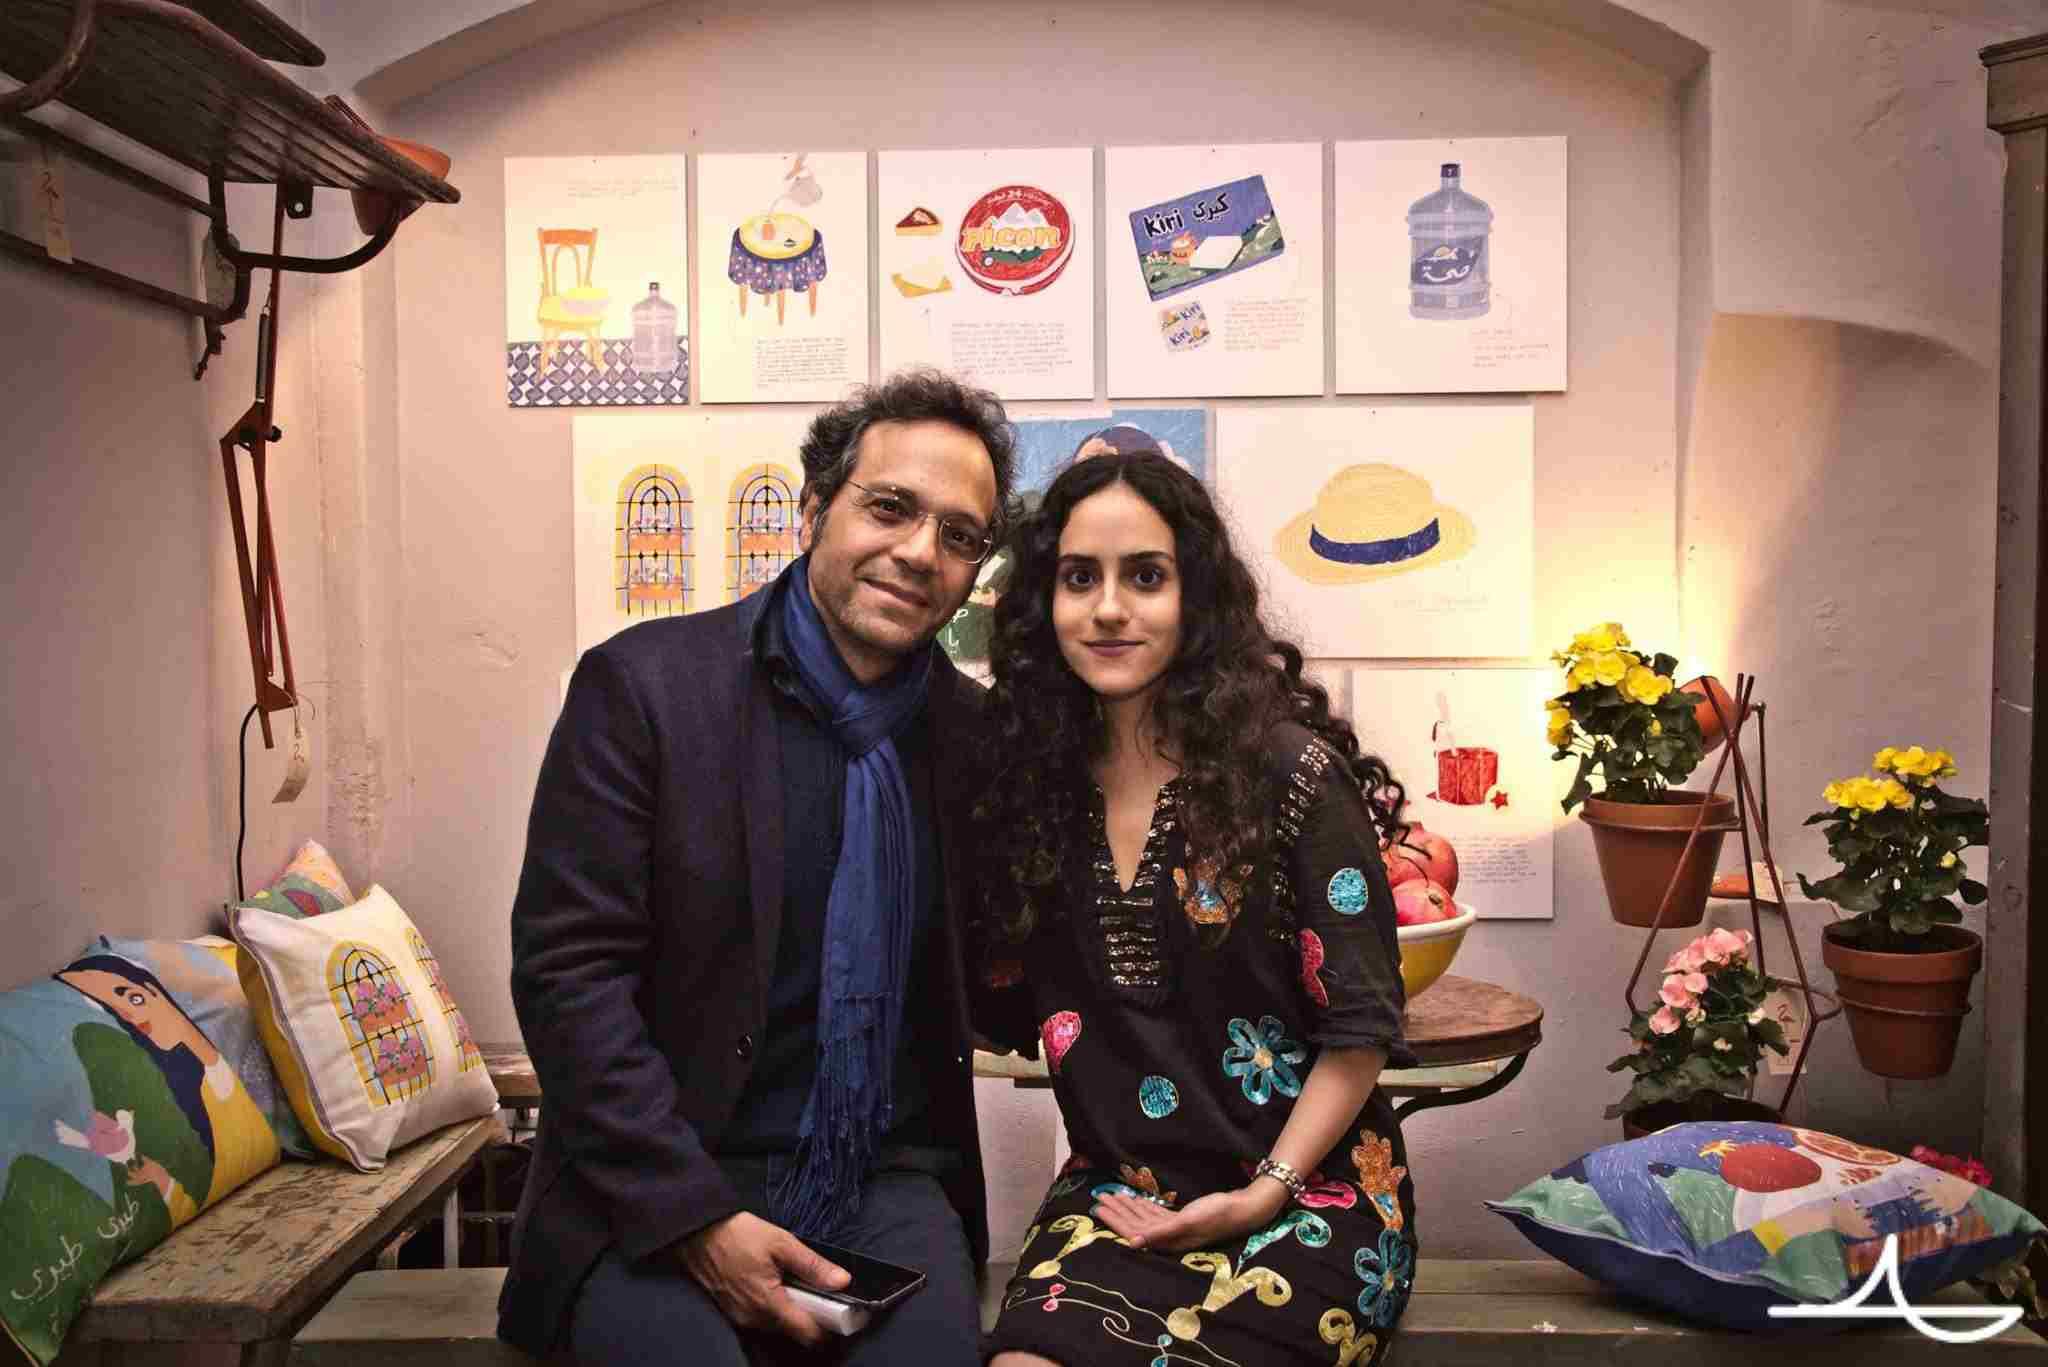 Lebanese-Kuwaiti illustrator Nour Flayhan and her father